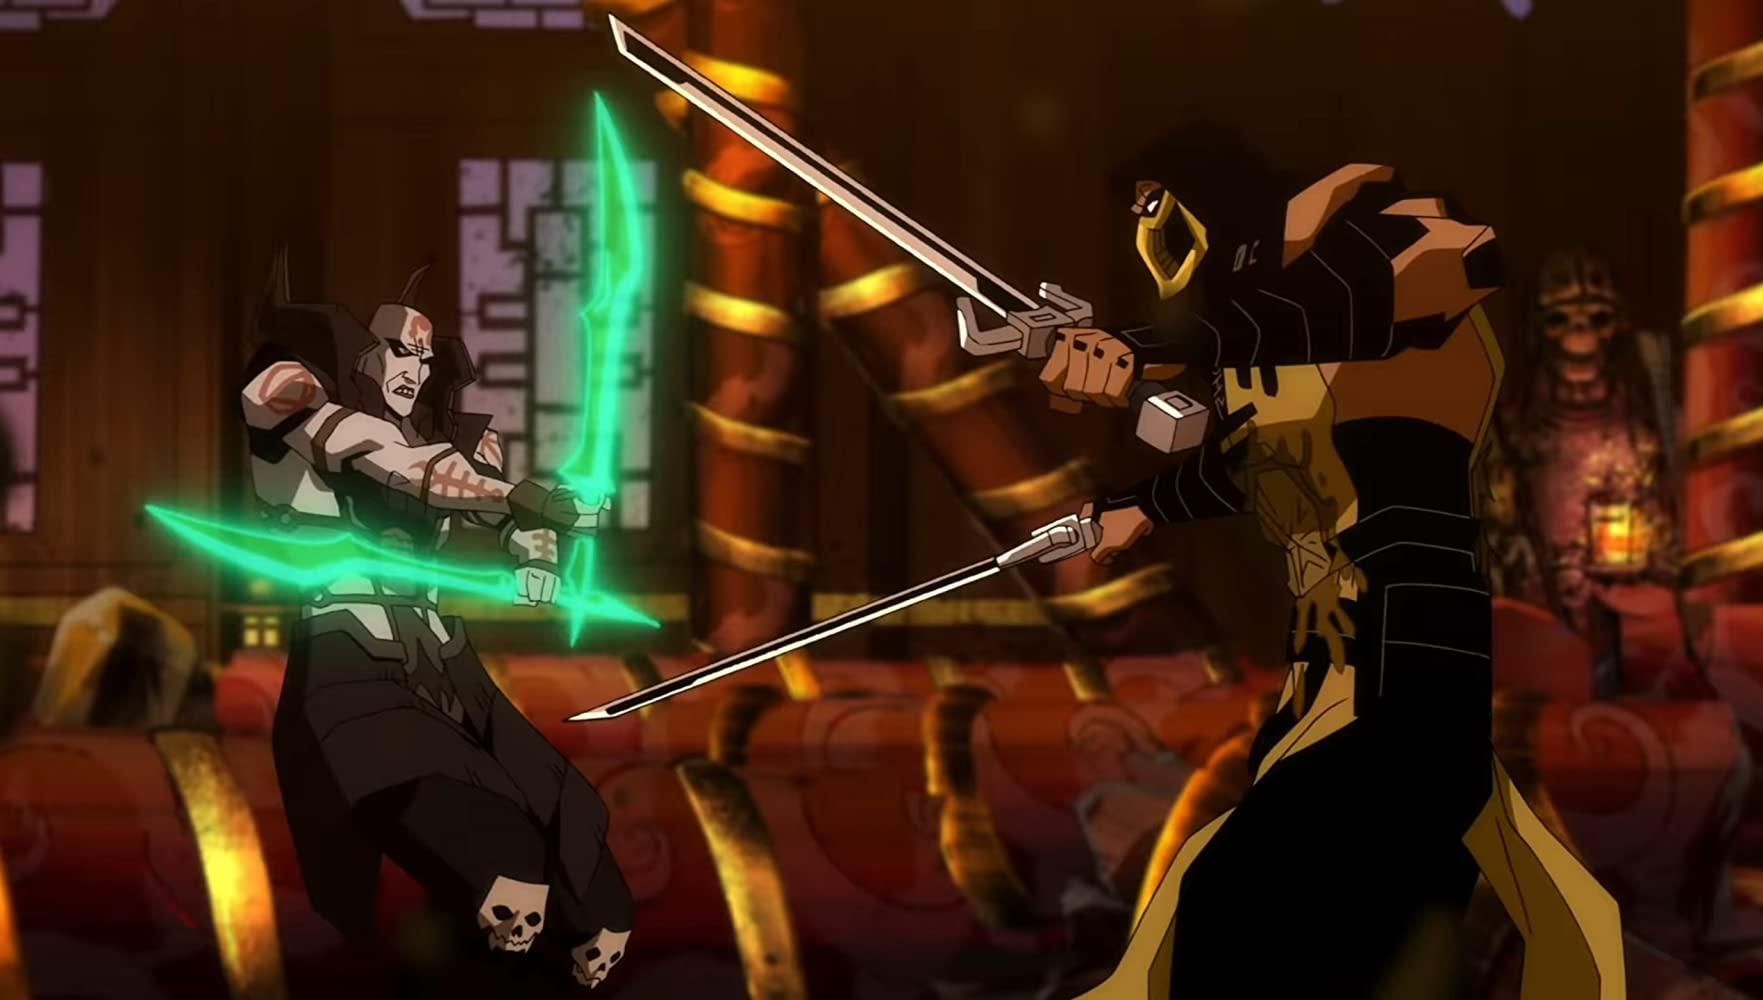 مشاهدة فيلم Mortal Kombat Legends Scorpions Revenge (2020) مترجم HD اون لاين